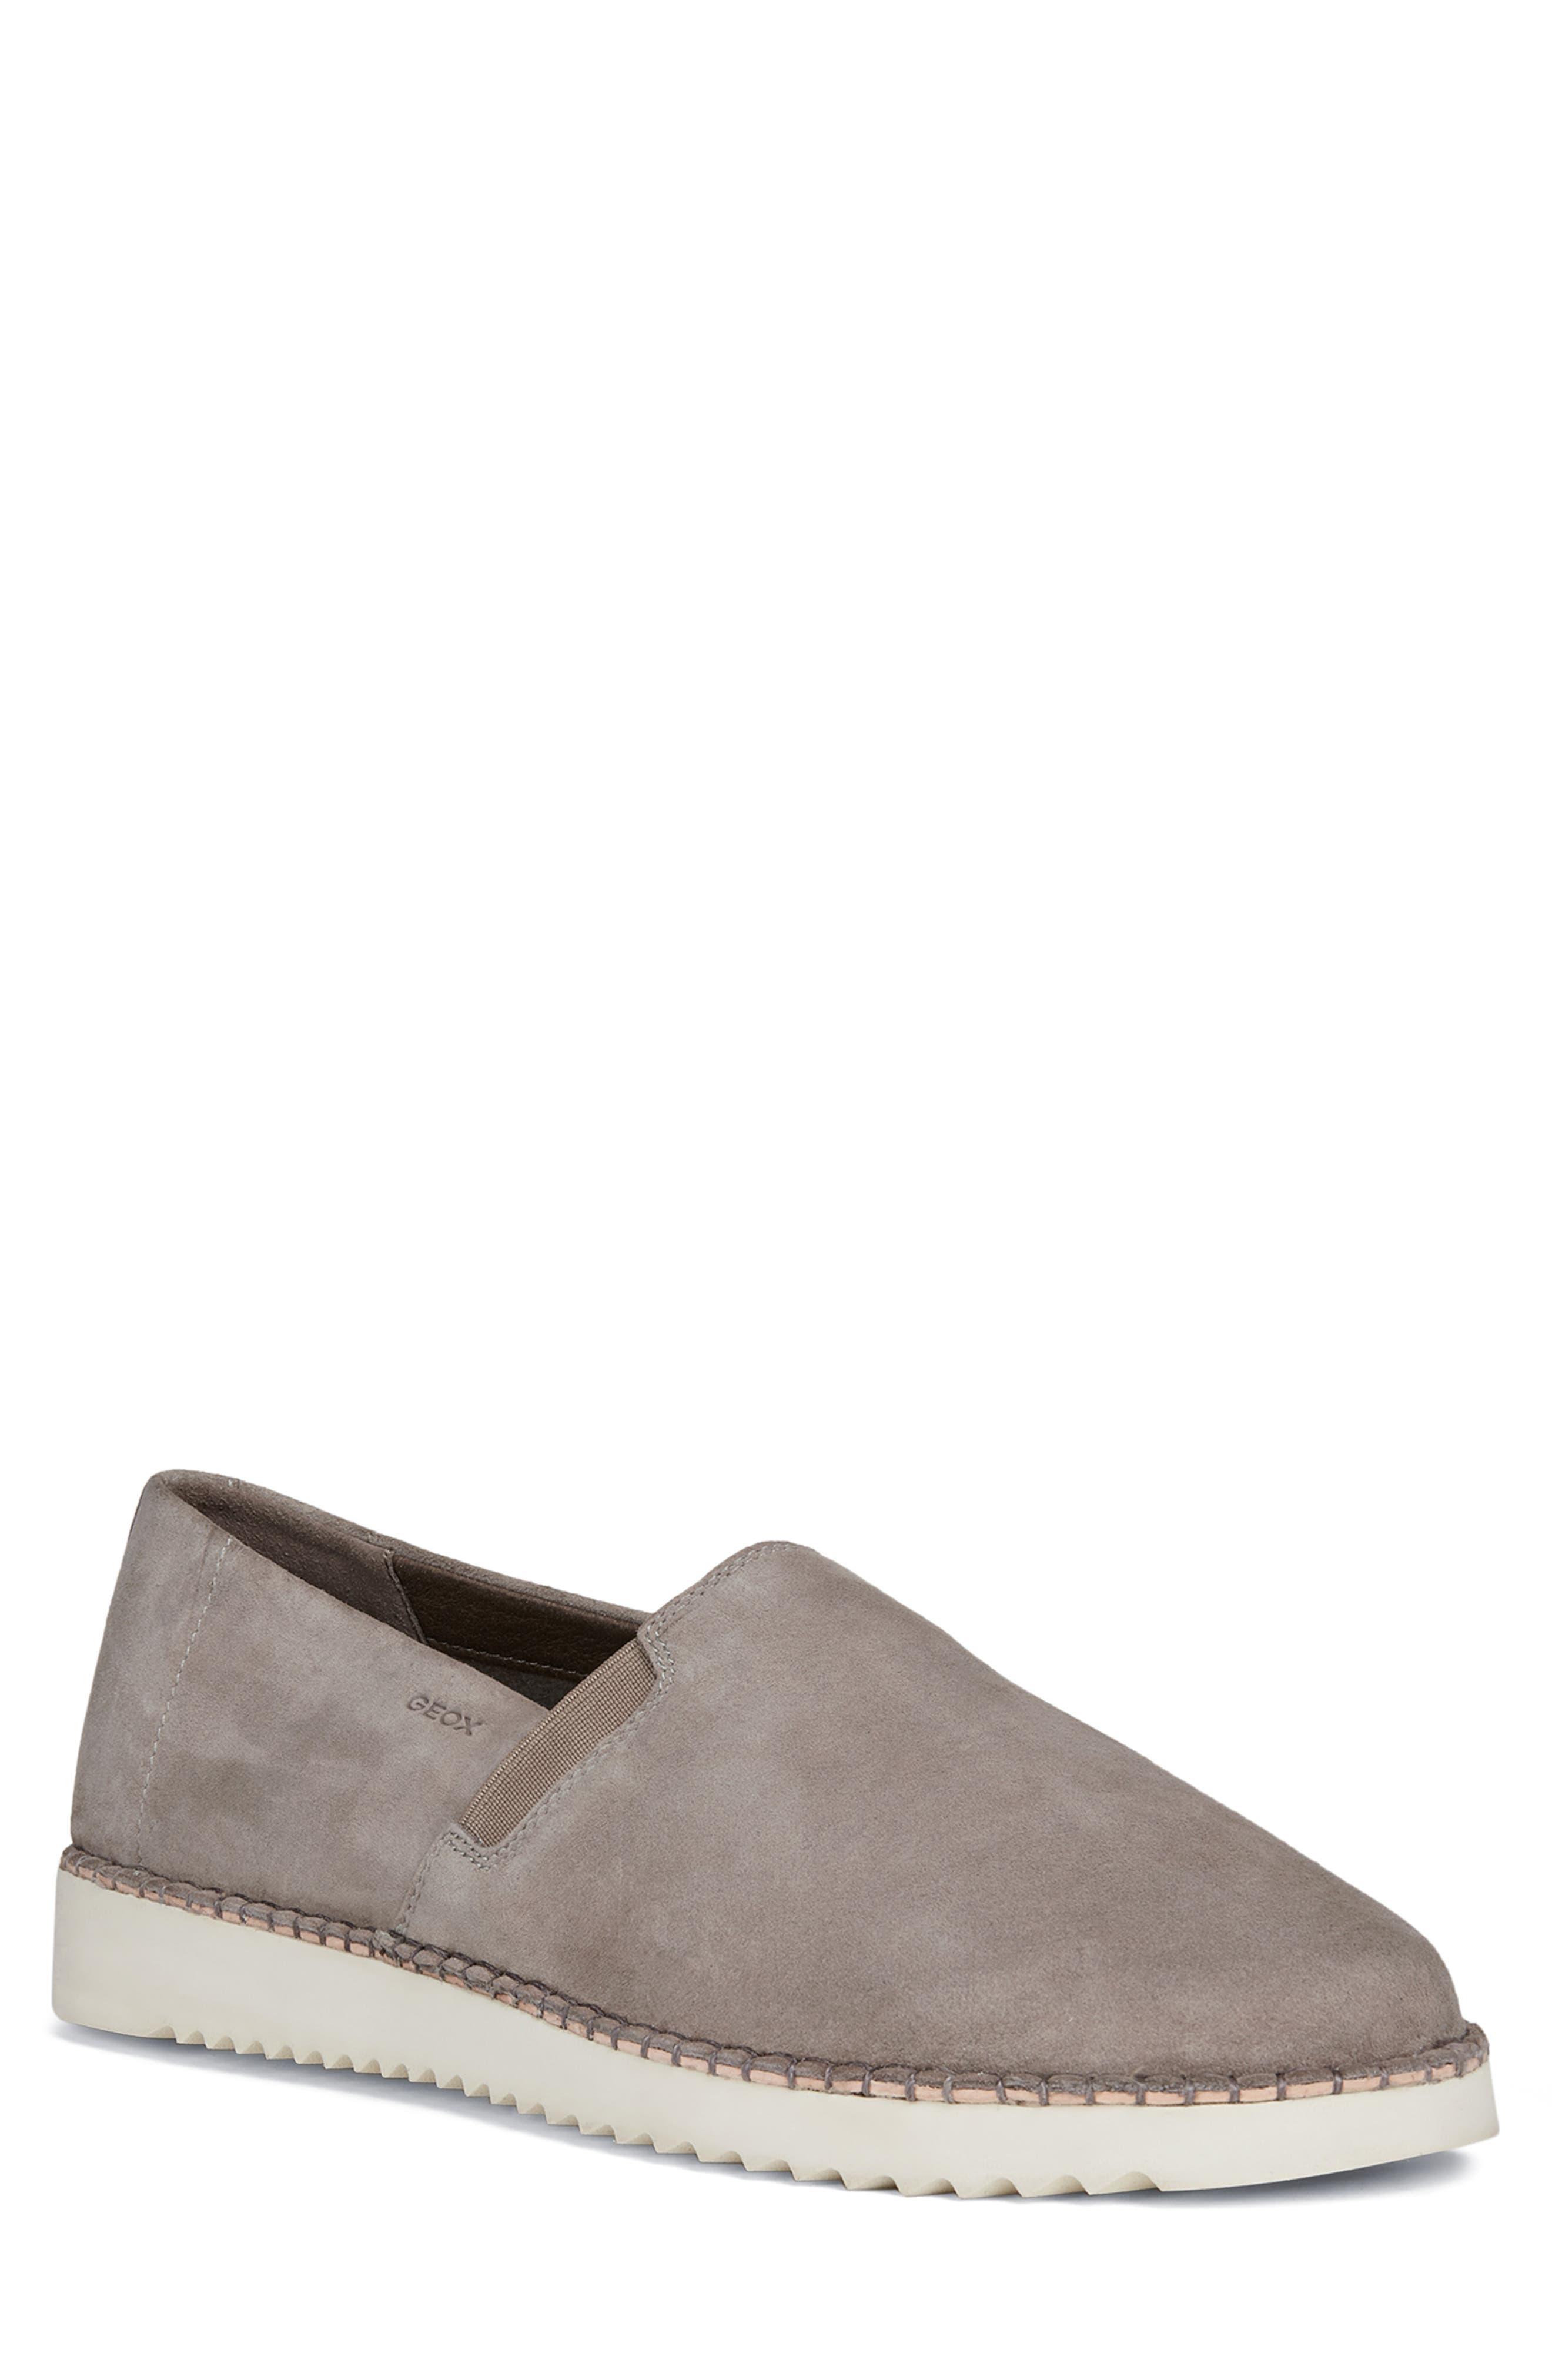 Dayan 2 Slip-On Sneaker, Main, color, SMOKE GREY LEATHER